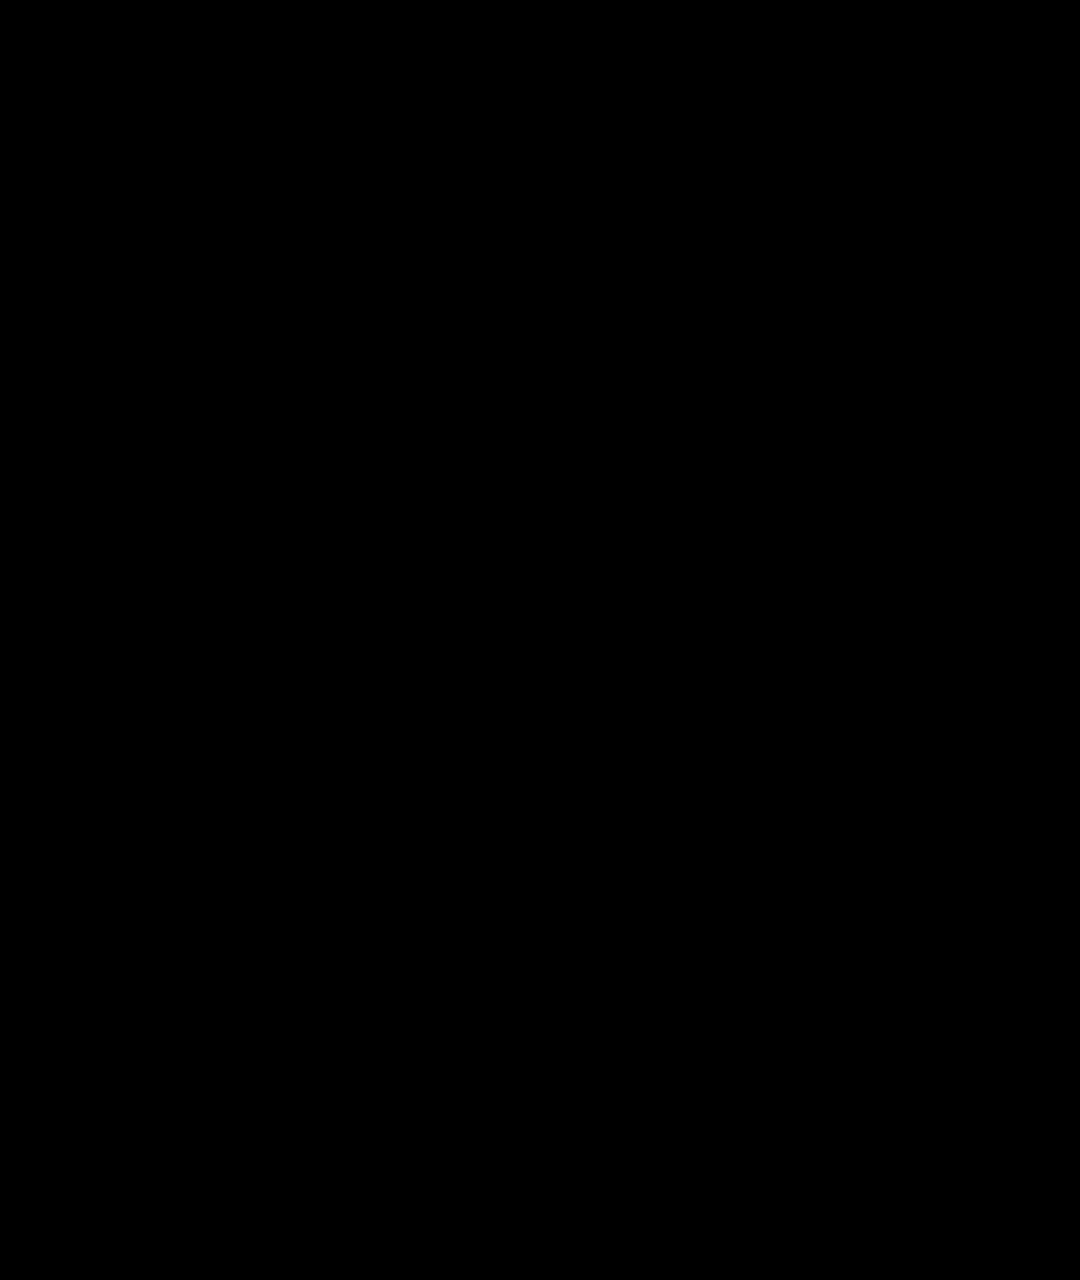 Dibujo de cobra